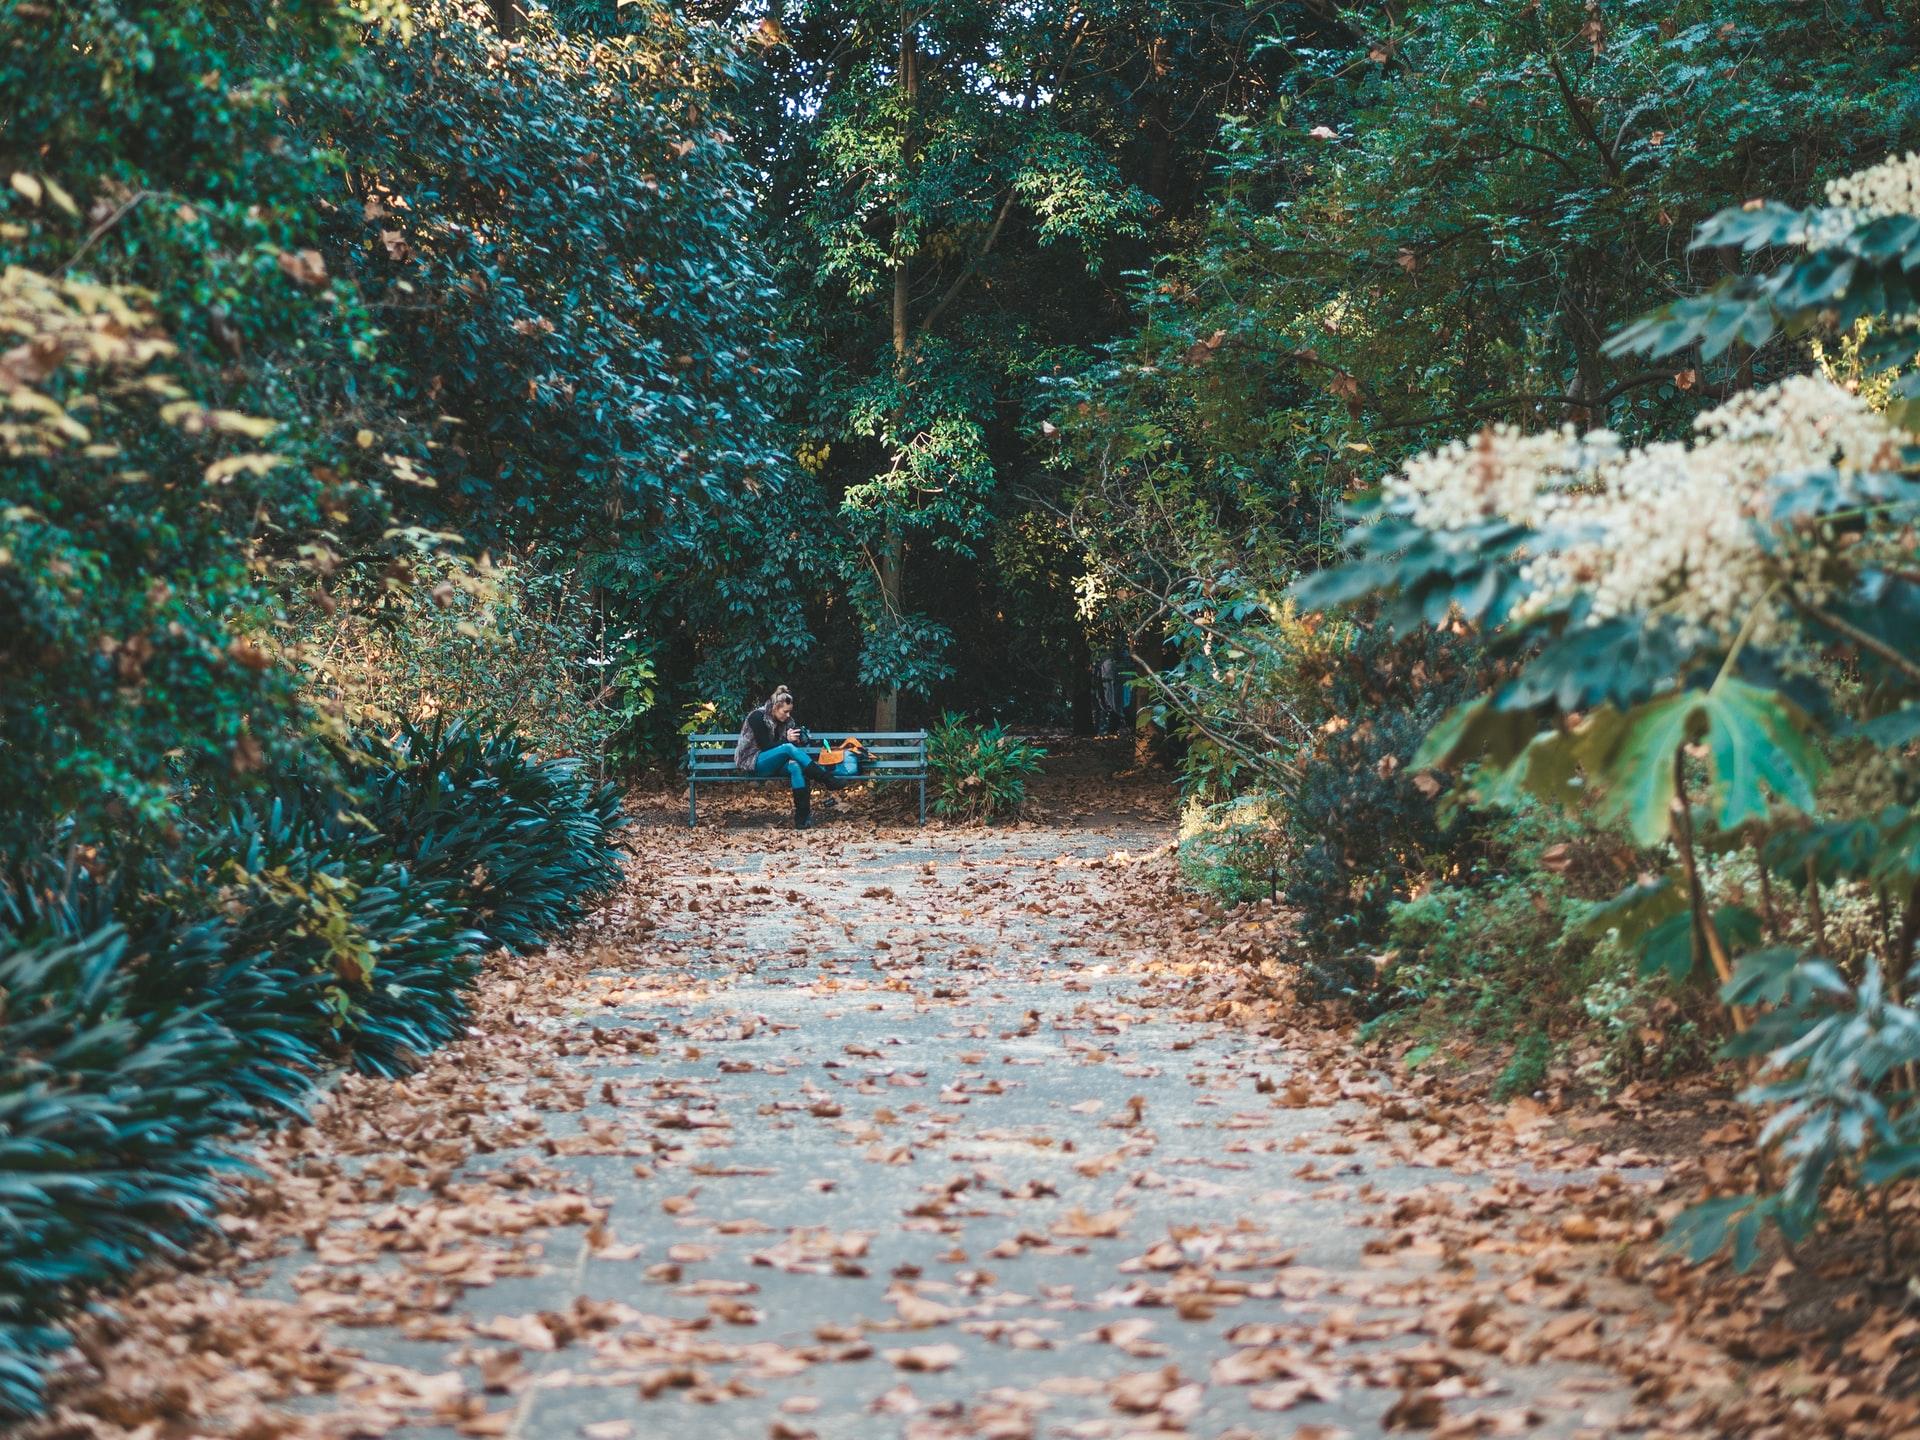 Cape Fear Botanical Garden in Fayetteville, NC